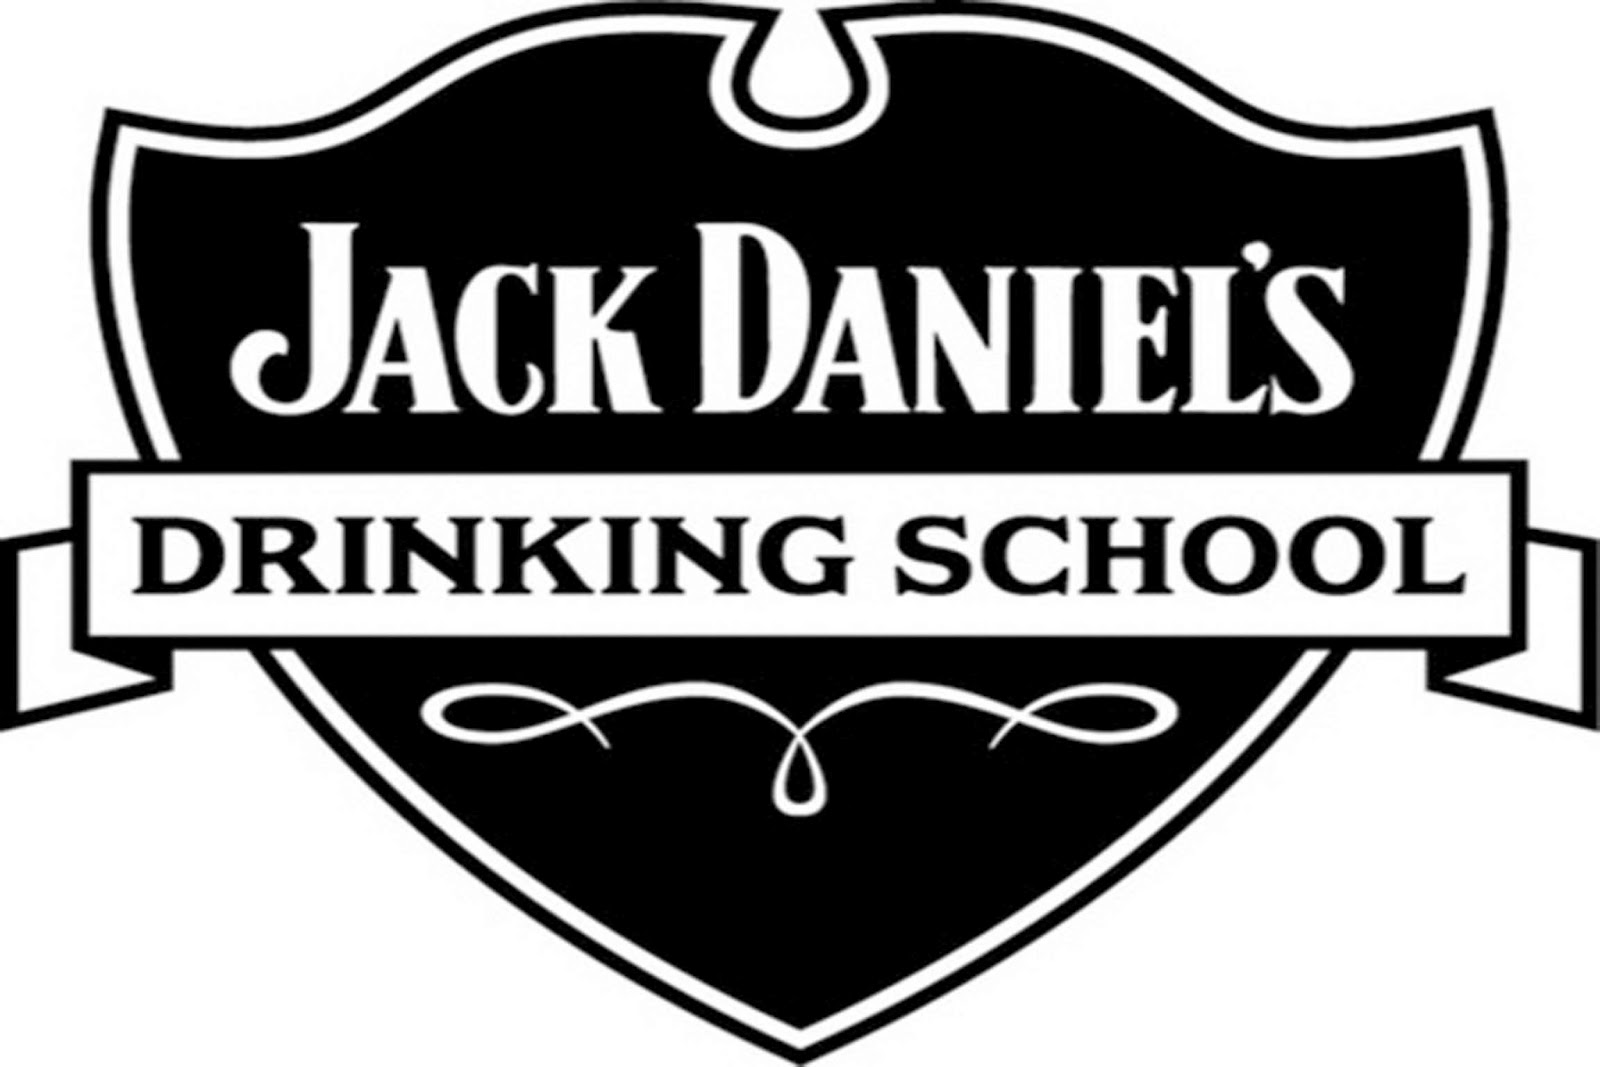 Jack Daniel S Logo Template Pictures to Pin on Pinterest ... Jack Daniels Logo Stencil